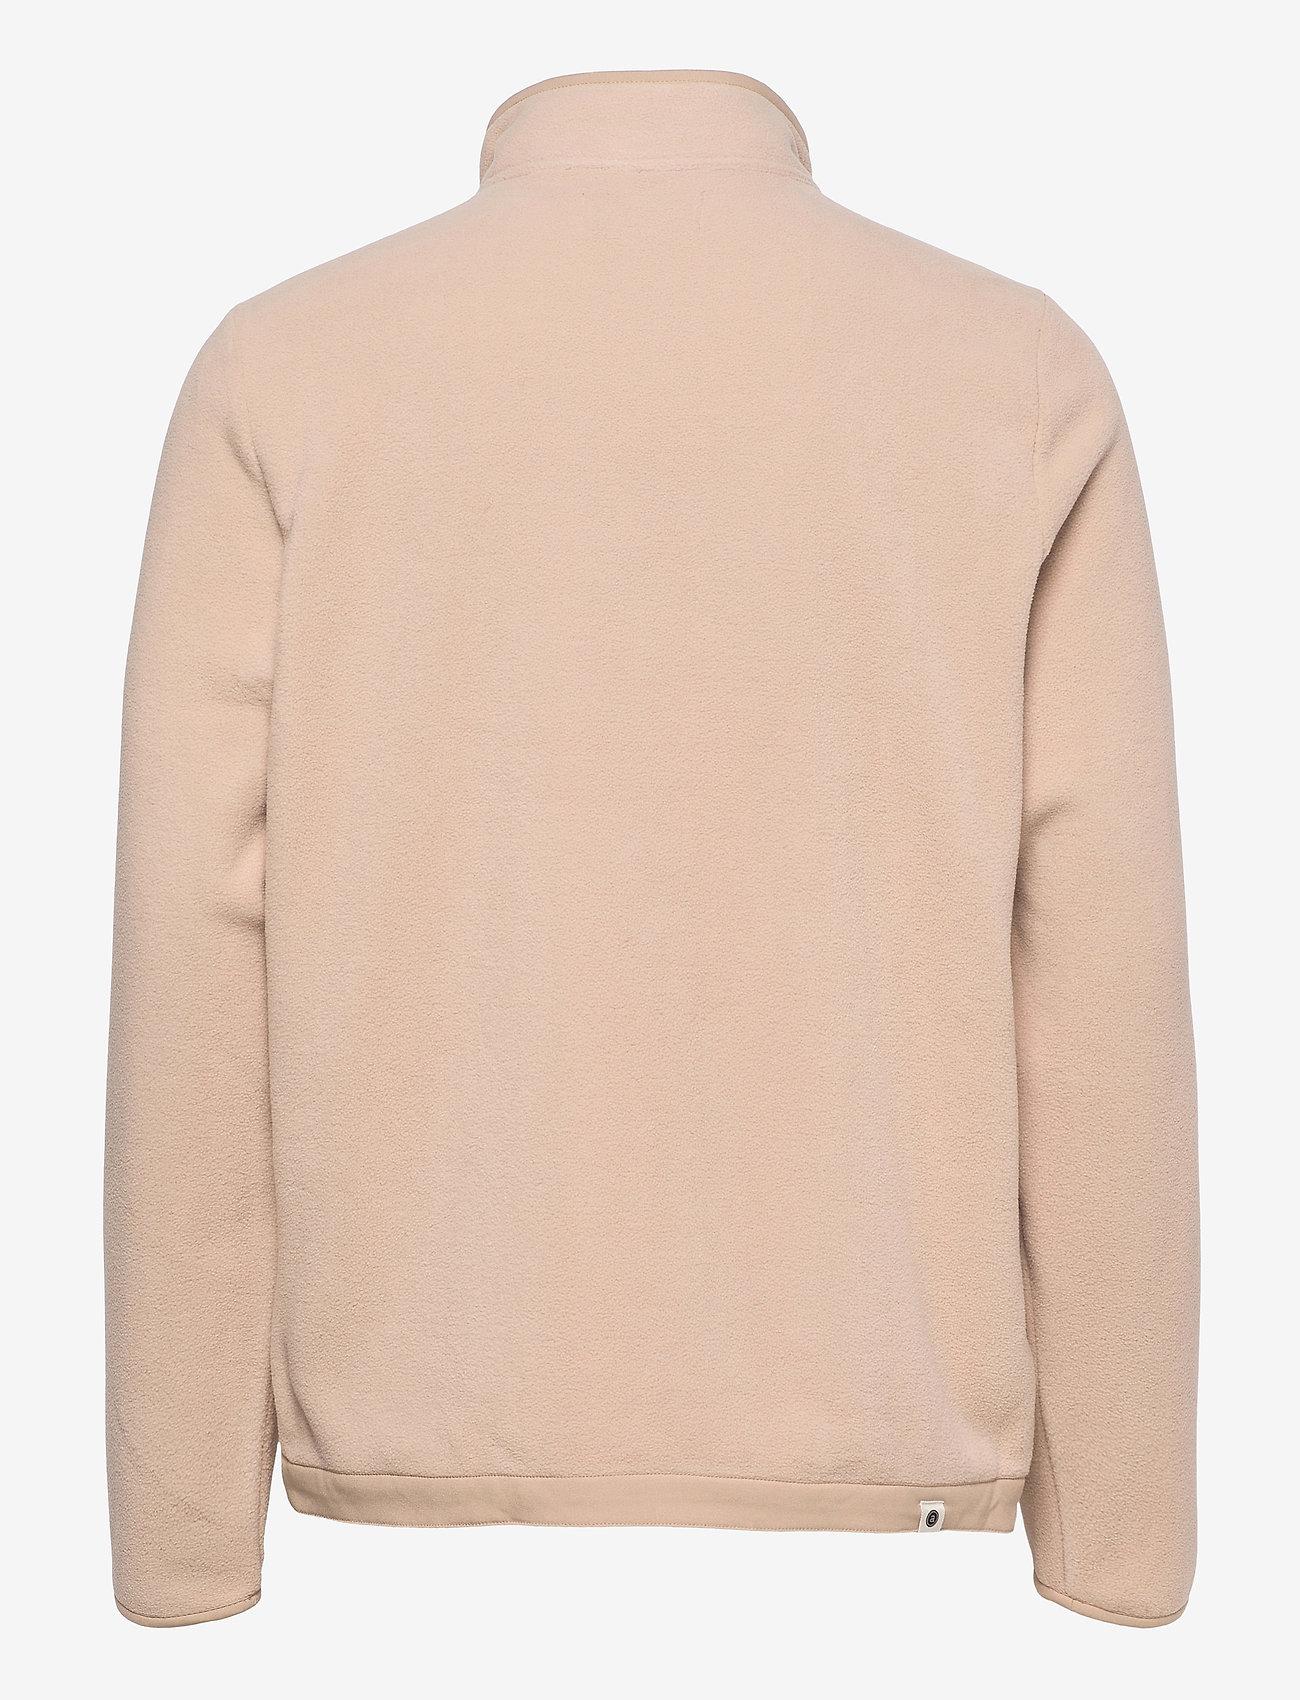 Anerkjendt - AKTOM FLEECE CARDIGAN - basic-sweatshirts - brown rice - 1